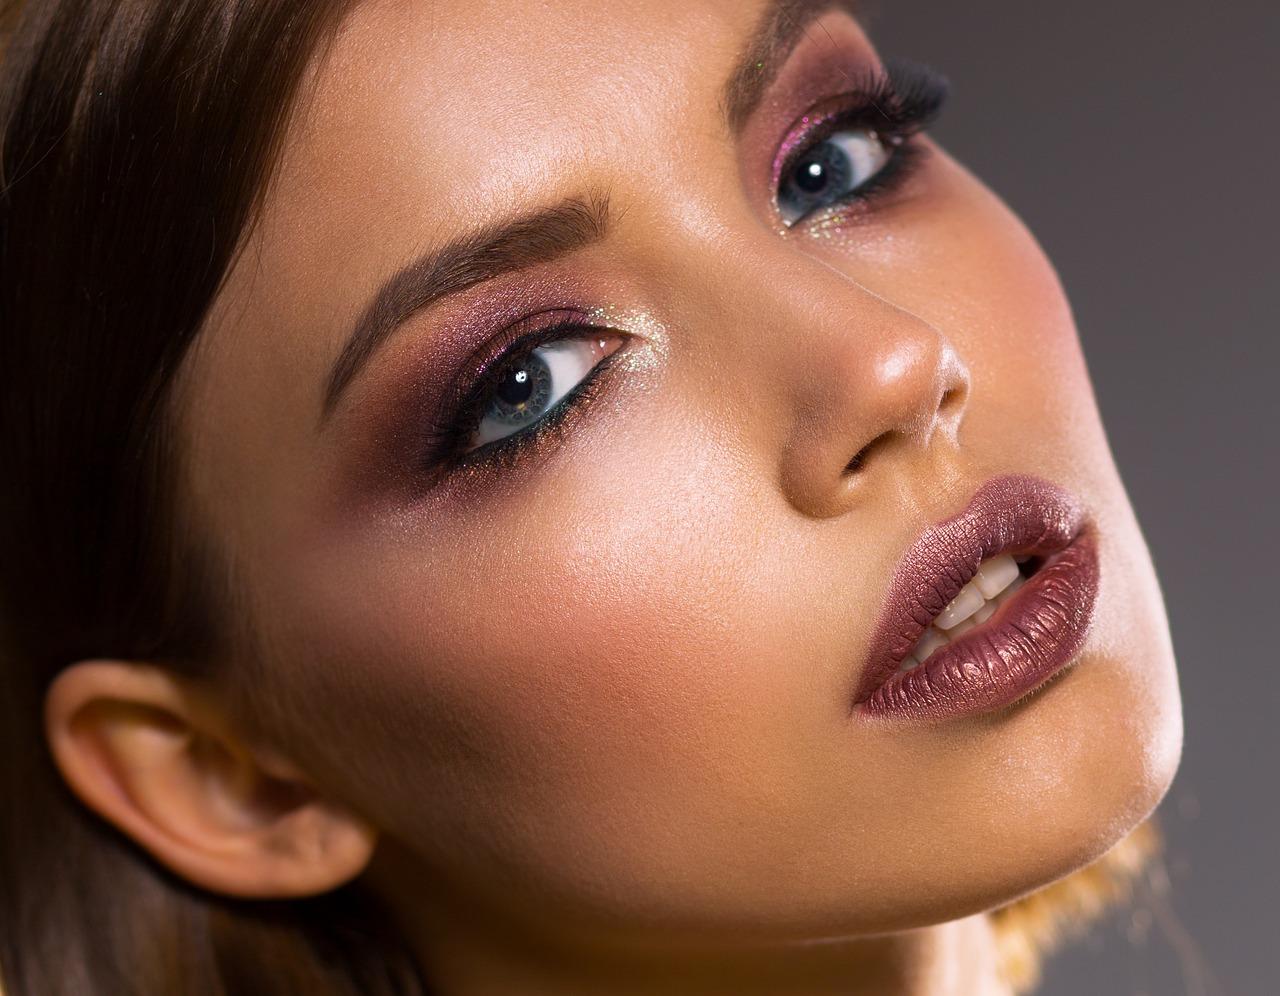 Die Make-up Trends 2018 werden bunt